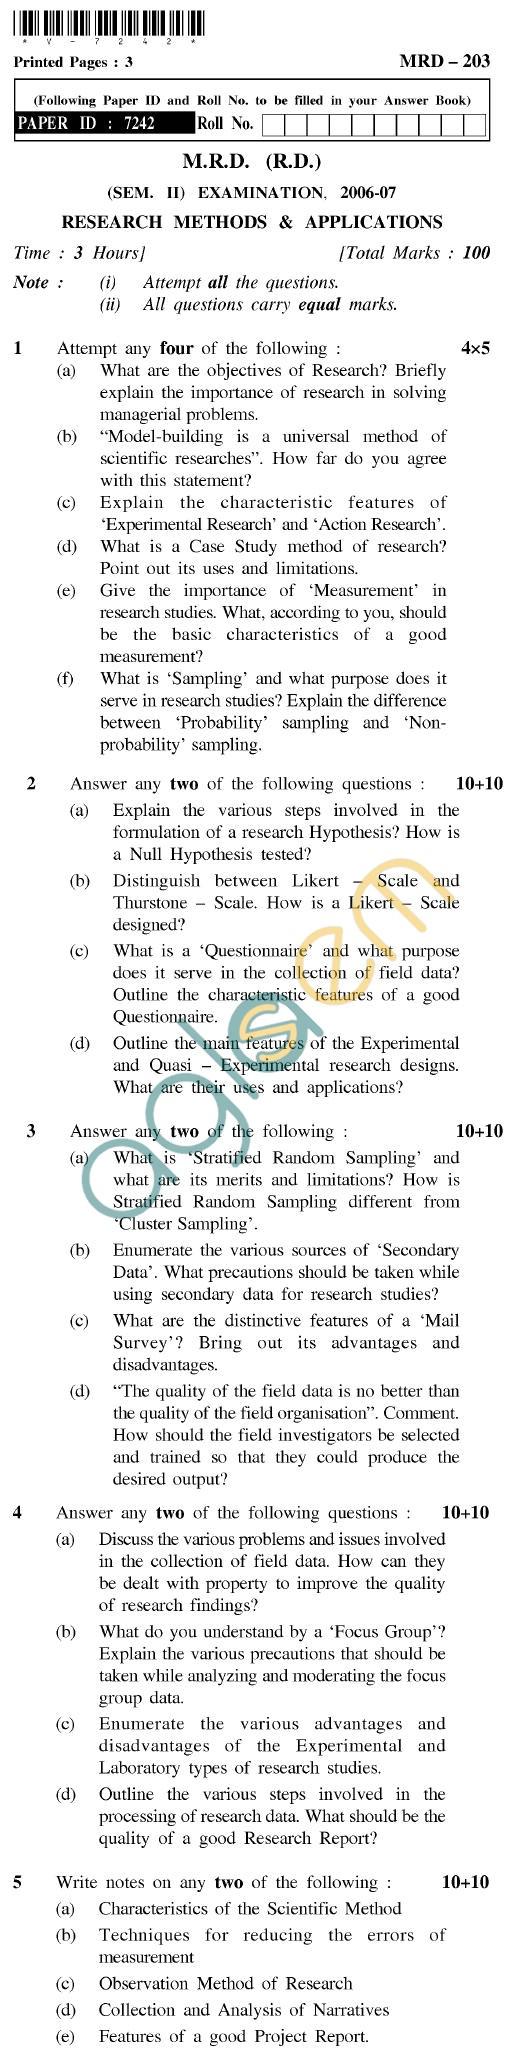 UPTU MRD (RD) Question Papers - MRD-203-Research Methods & Applications